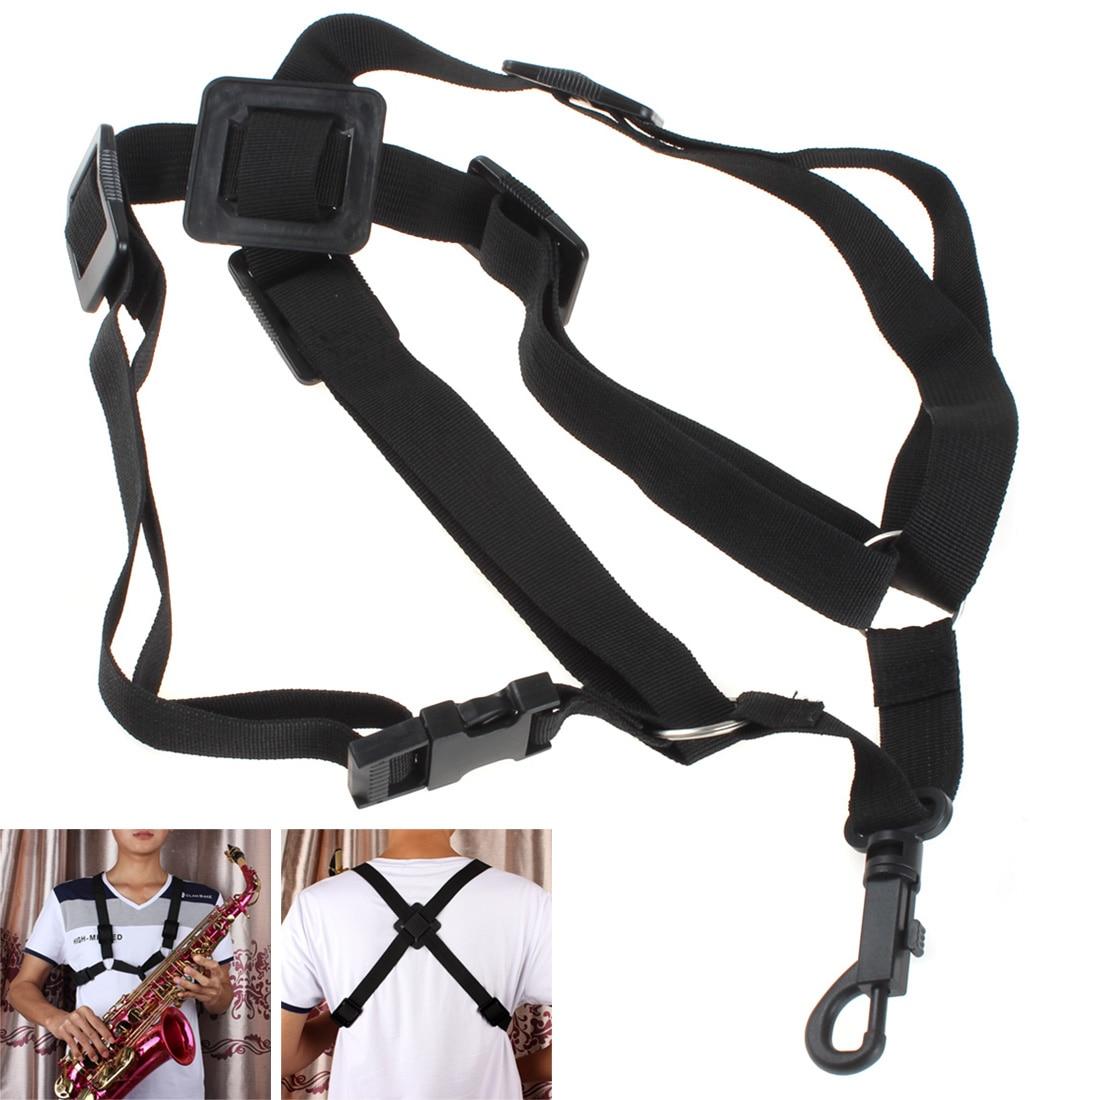 sale black adjustable universal sax harness shoulder strap for alto tenor soprano saxophone. Black Bedroom Furniture Sets. Home Design Ideas